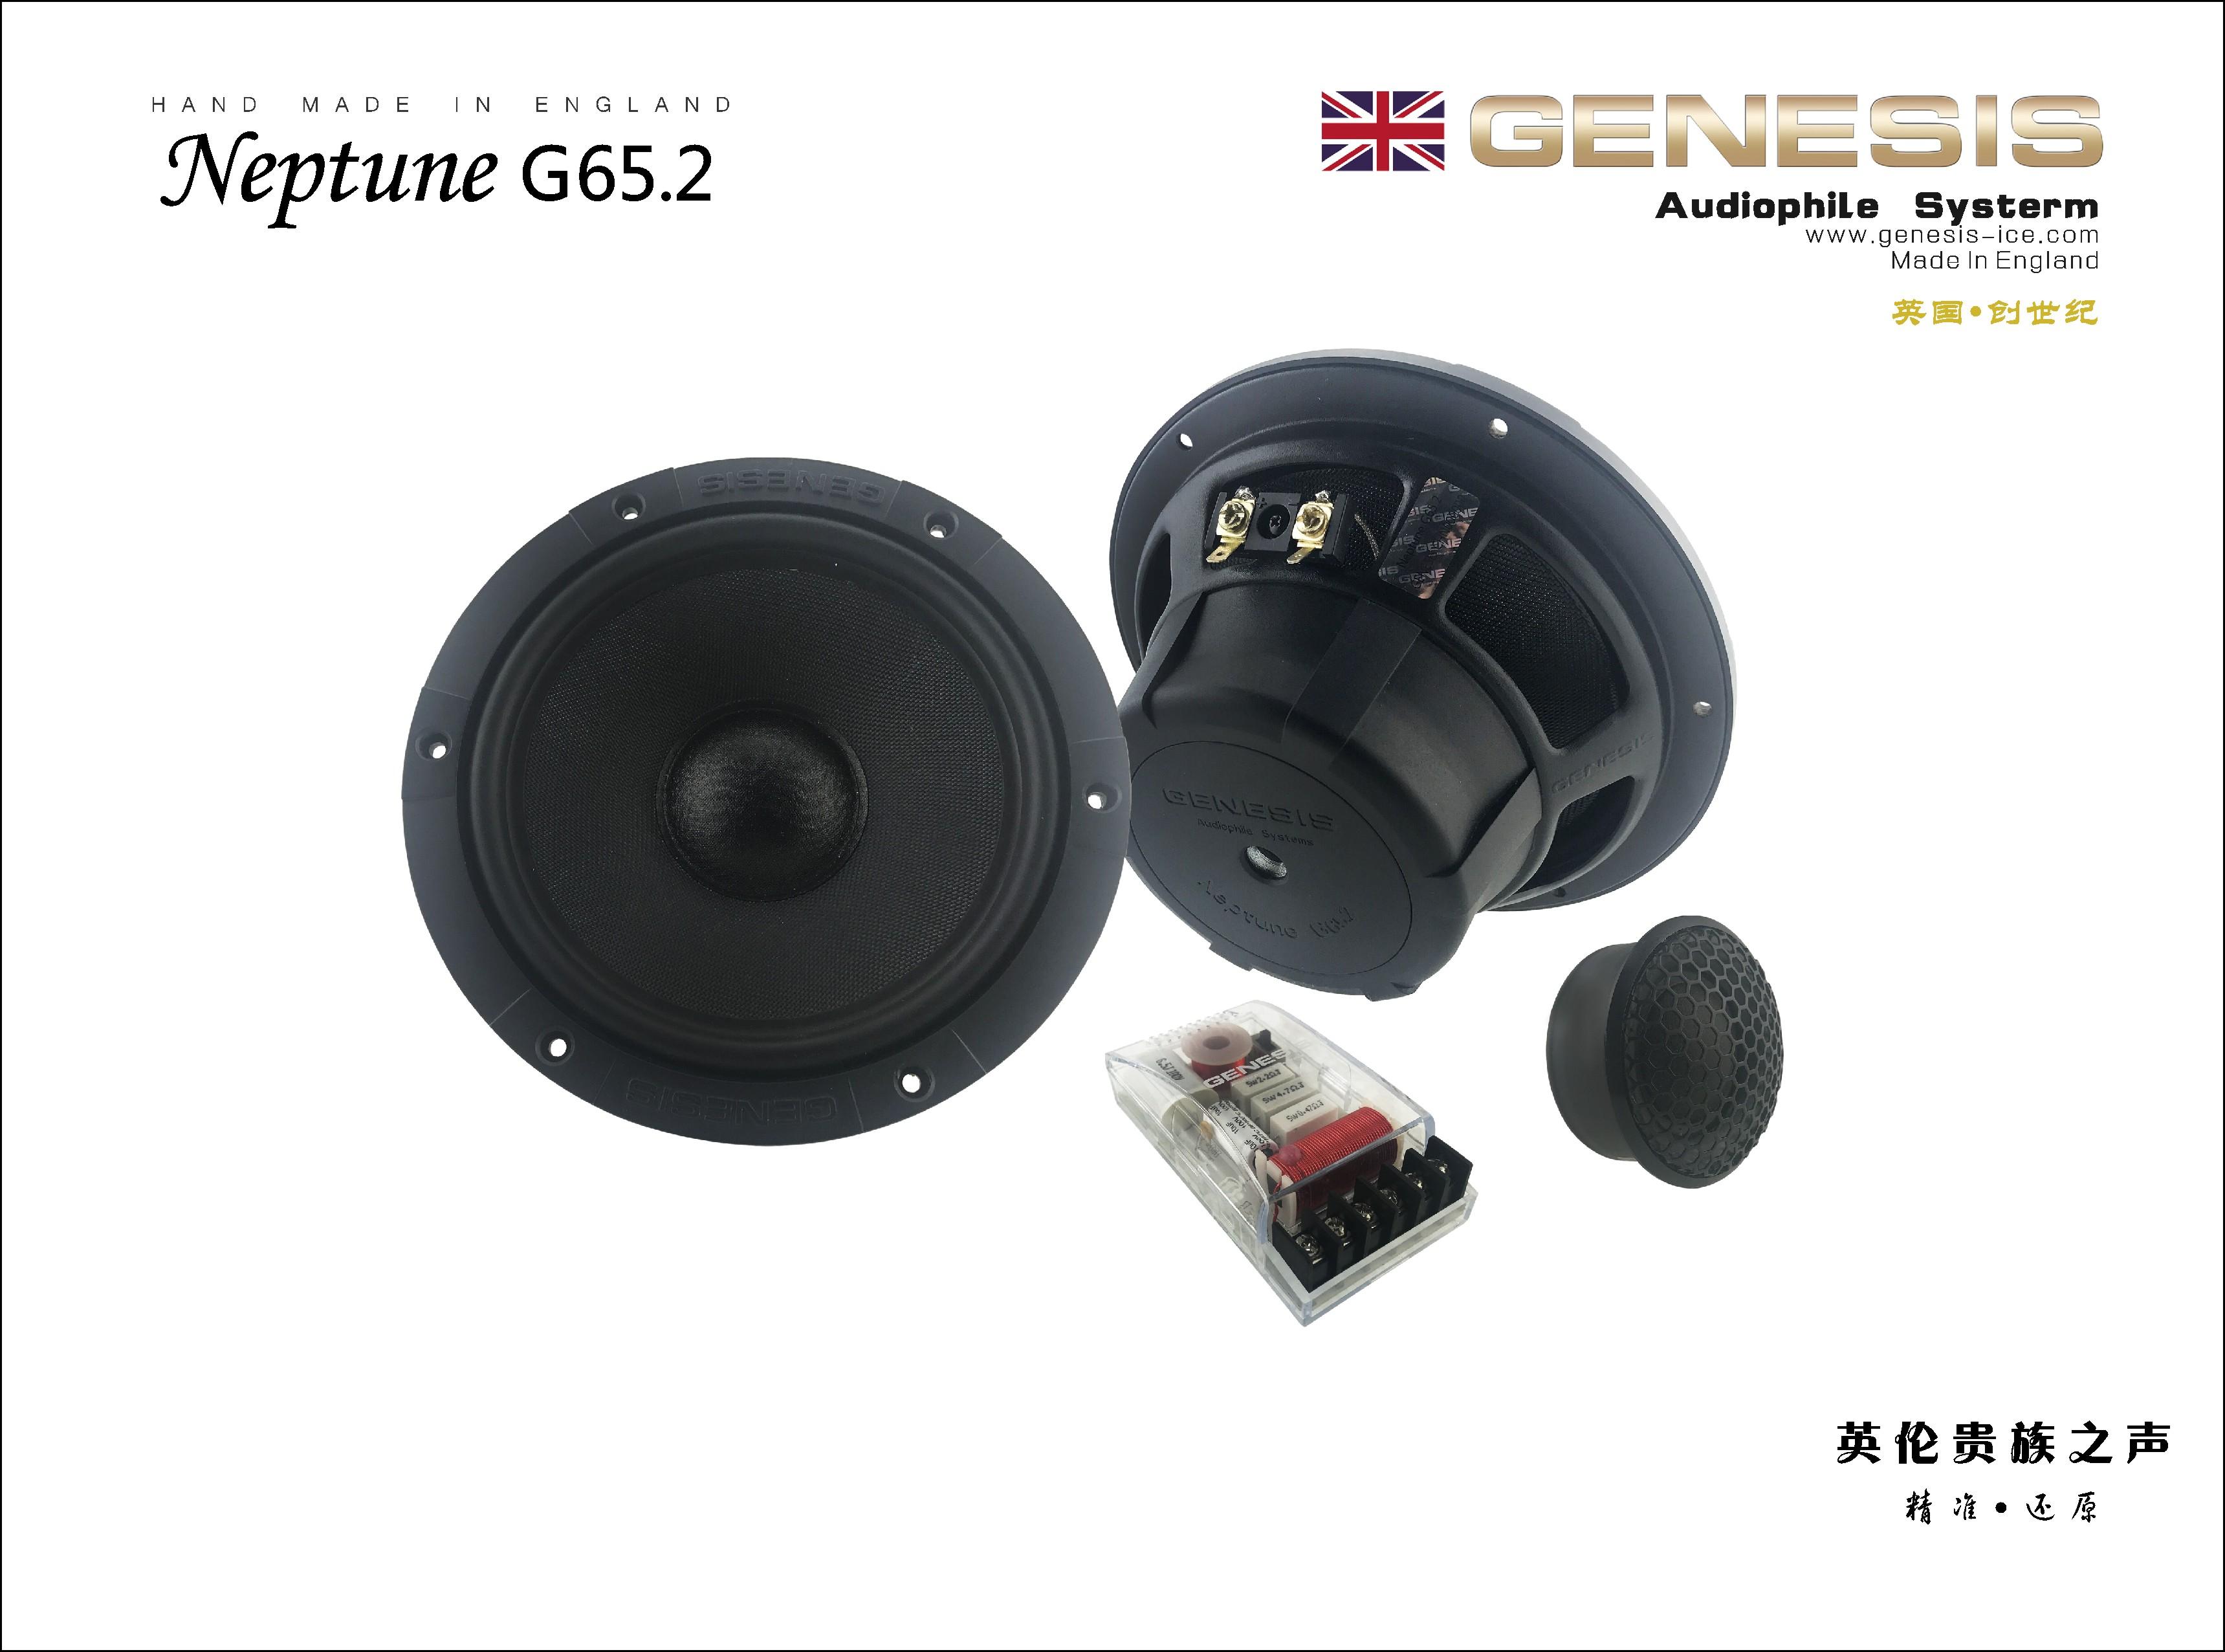 Neptune G65.2